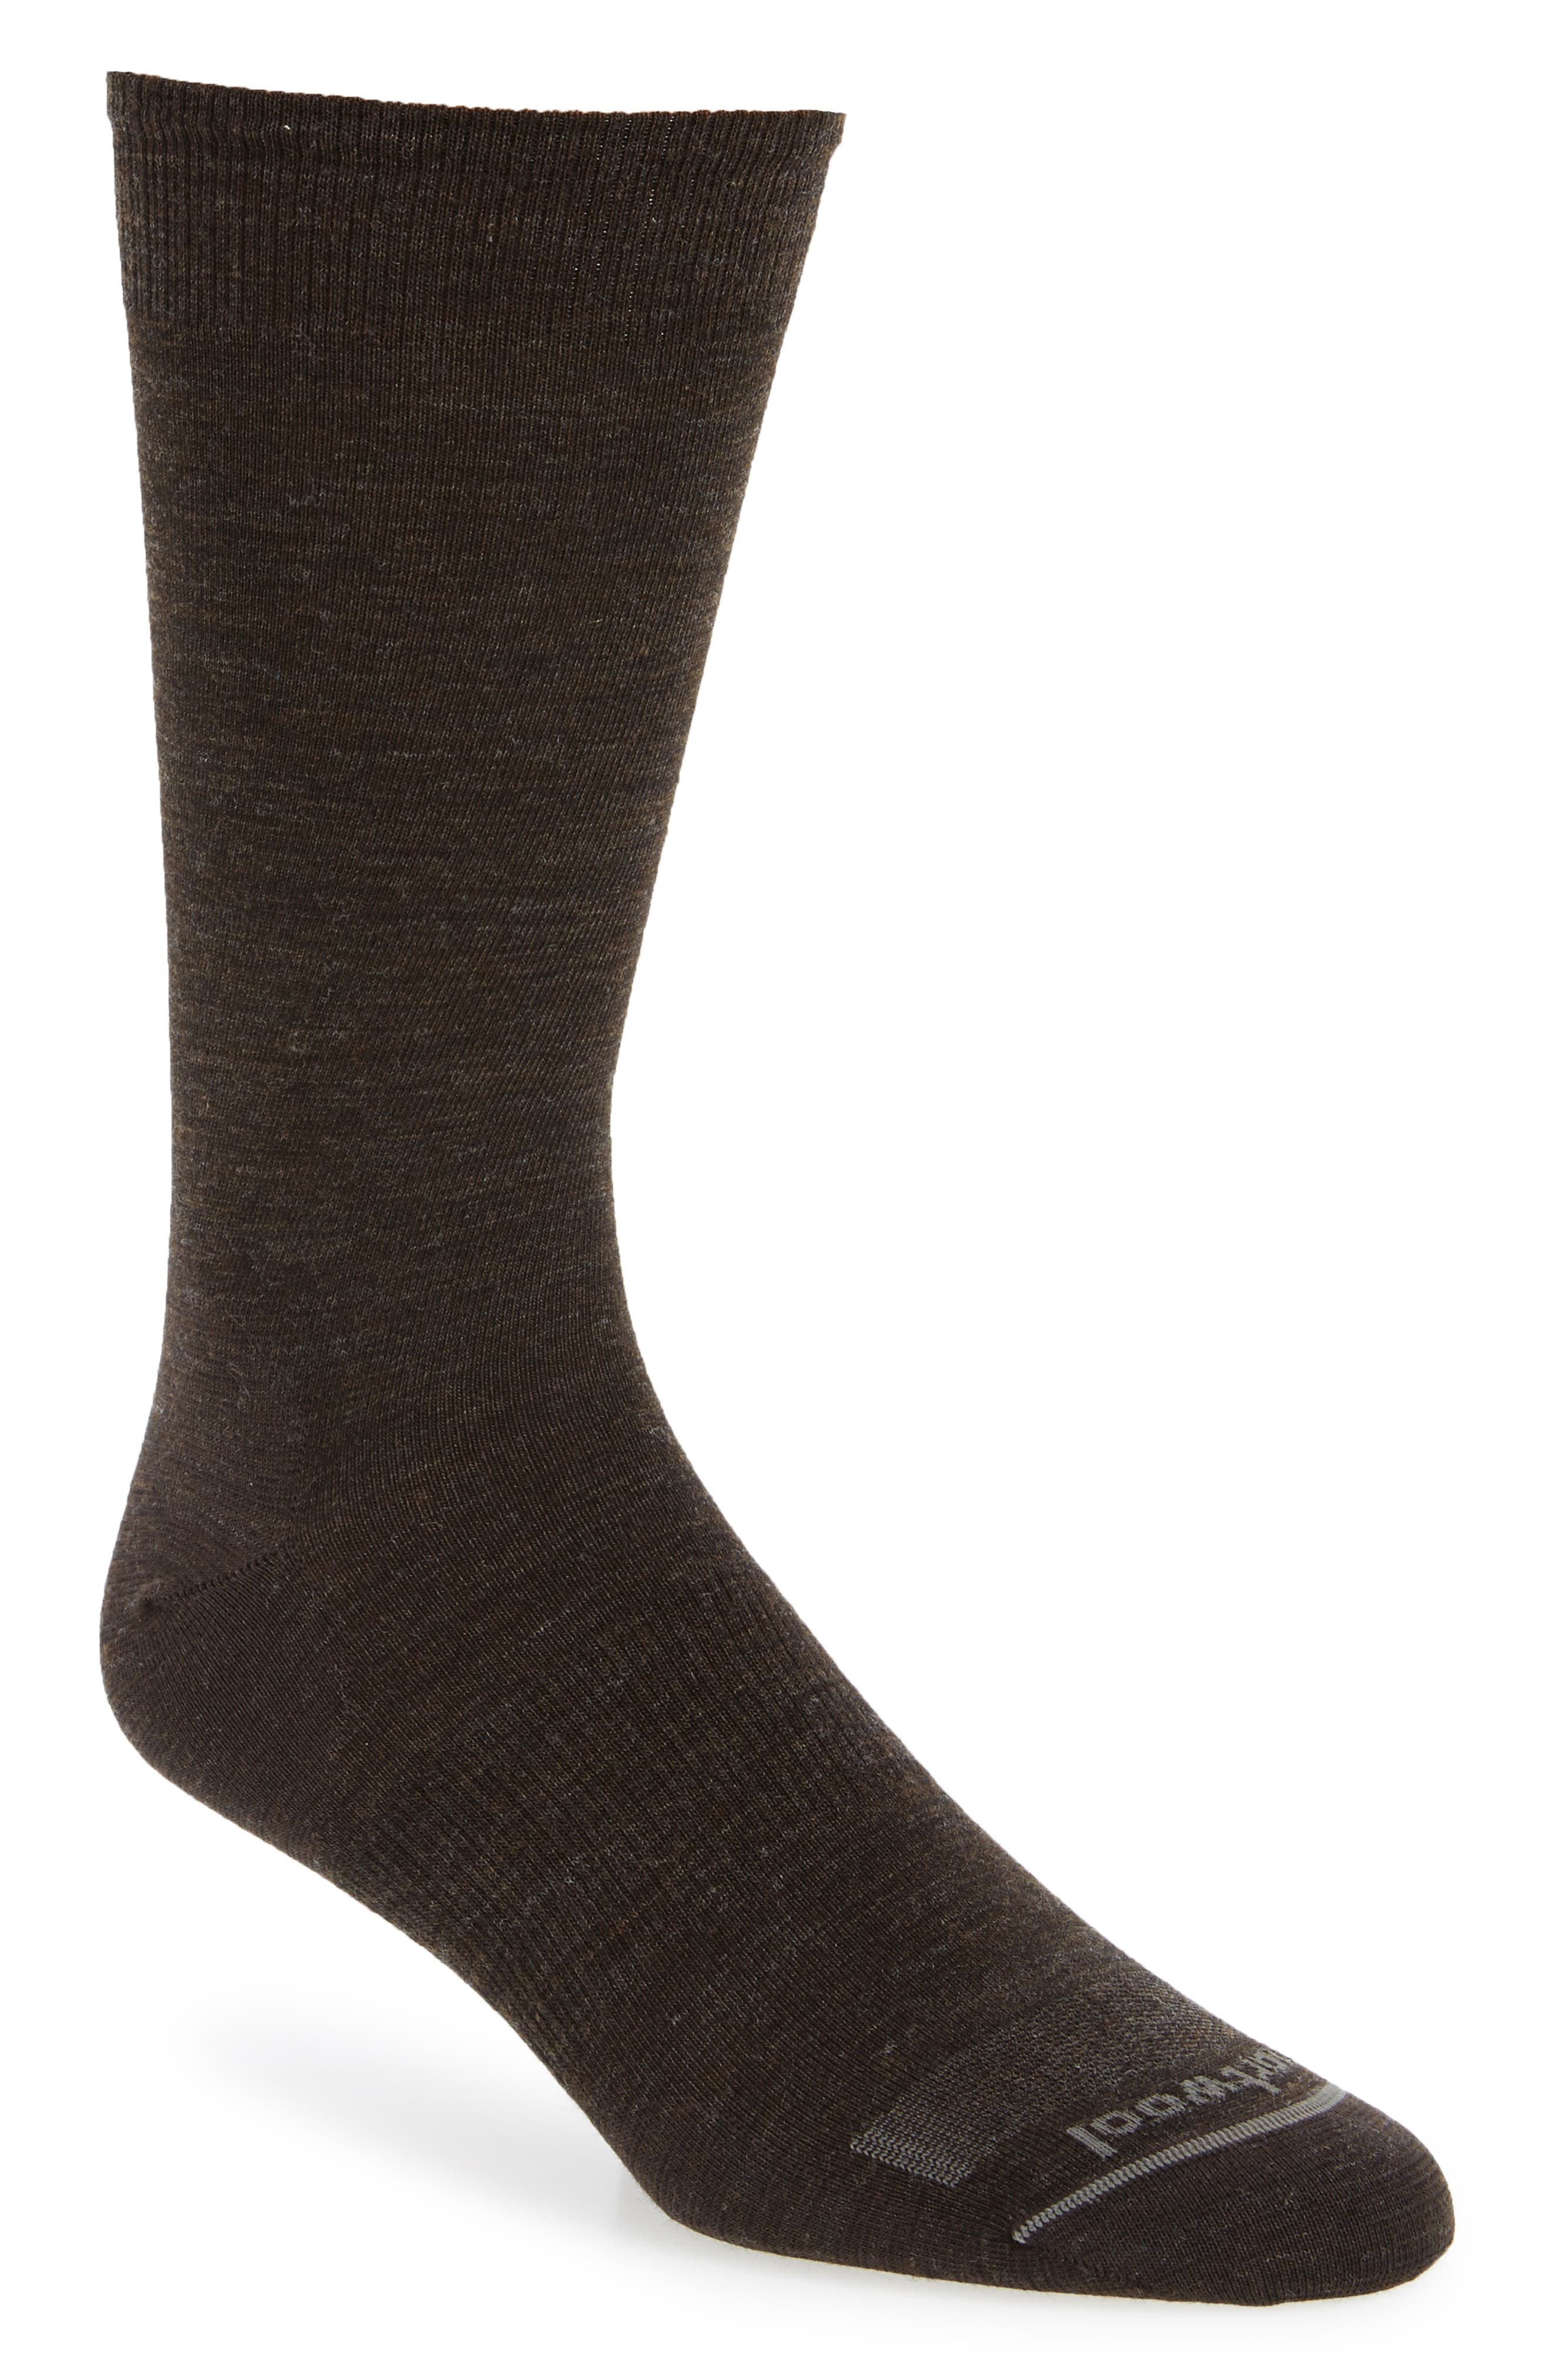 Alternate Image 1 Selected - Smartwool 'Anchor Line' Merino Wool Blend Socks